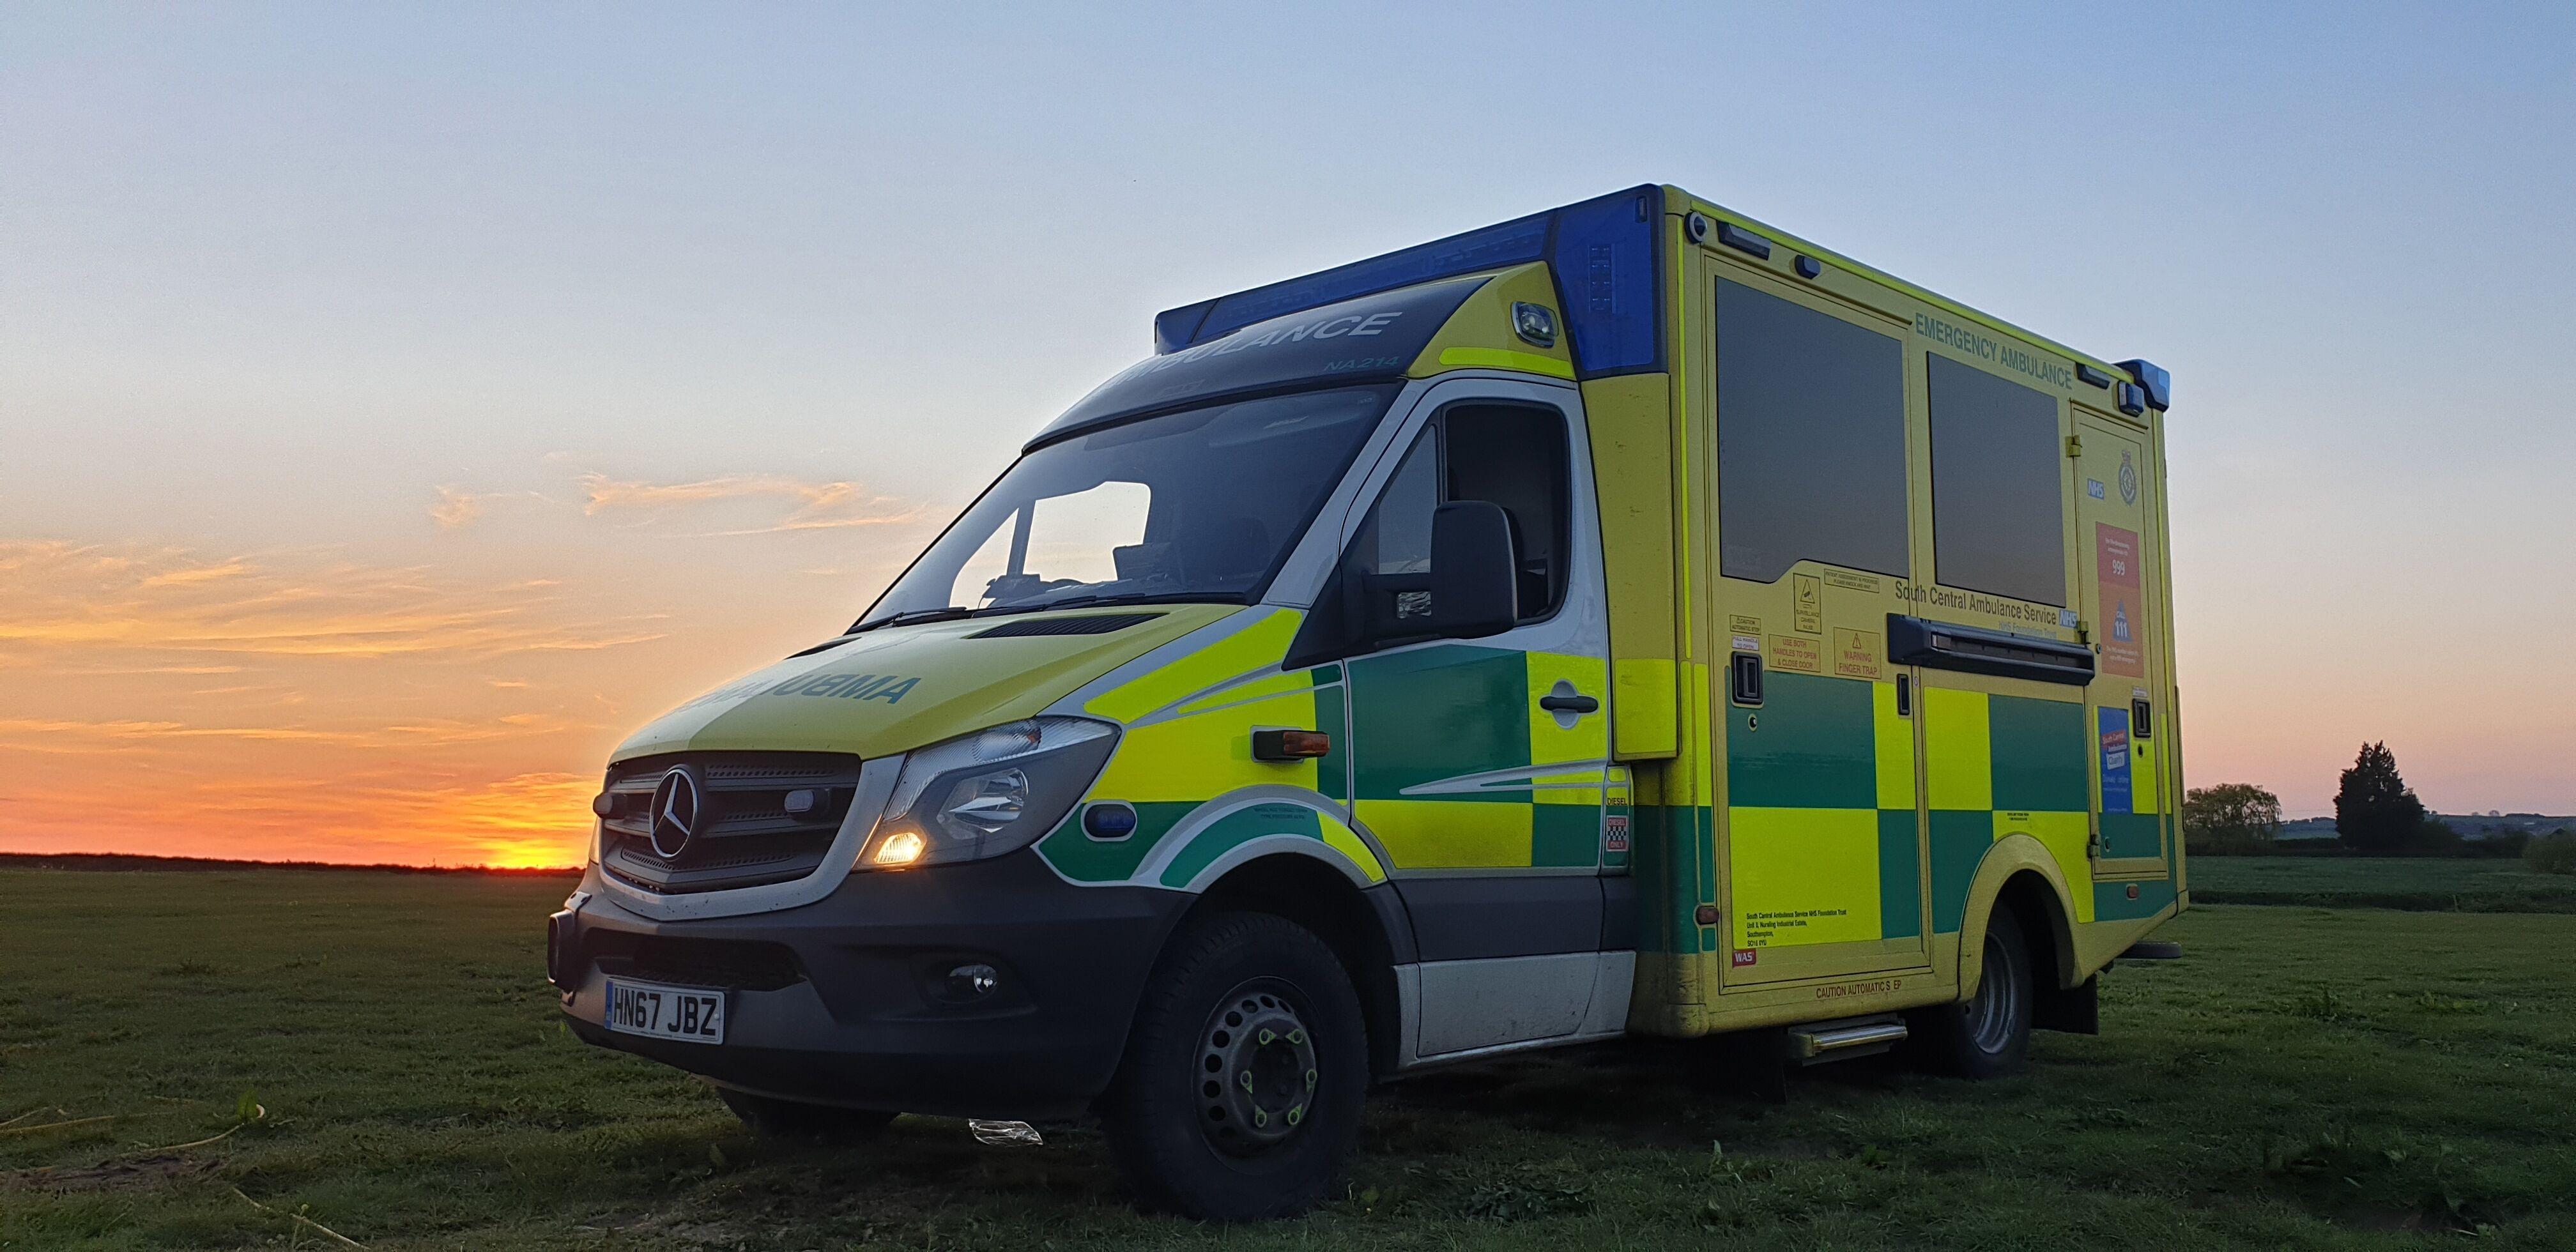 South Central Ambulance Service NHS Foundation Trust | LinkedIn